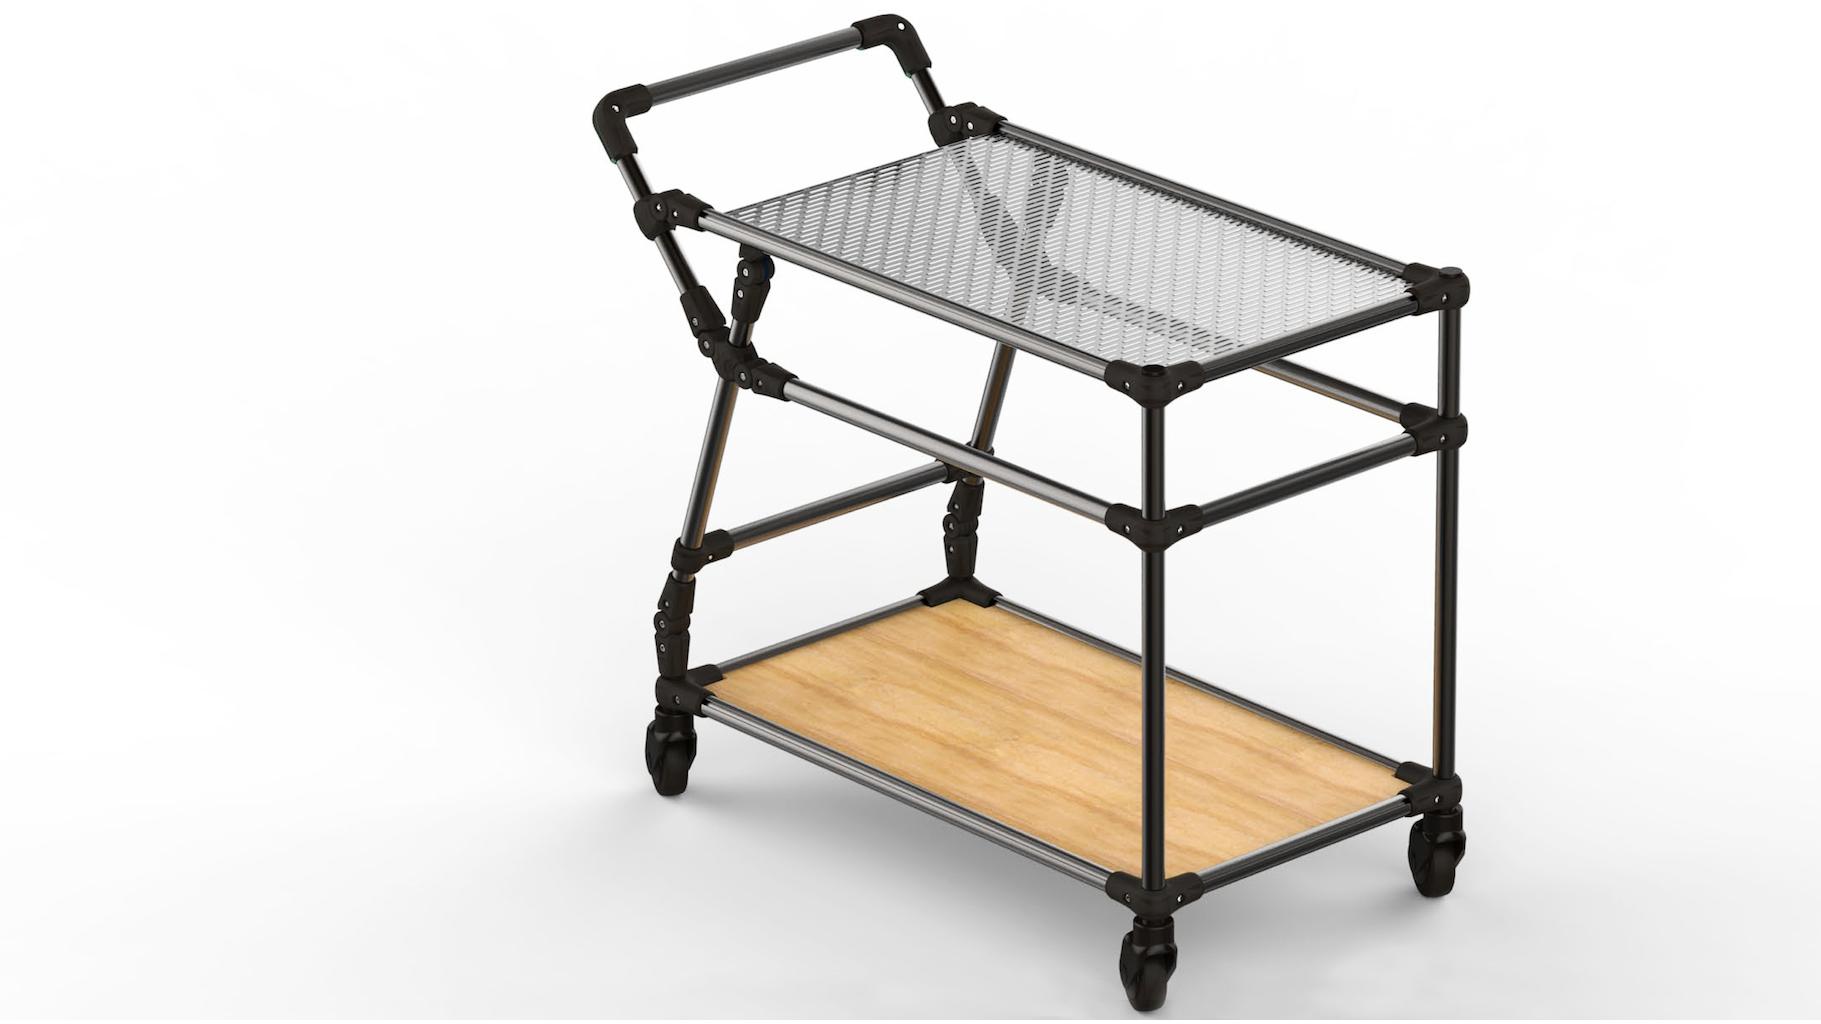 Multi-purpose trolley